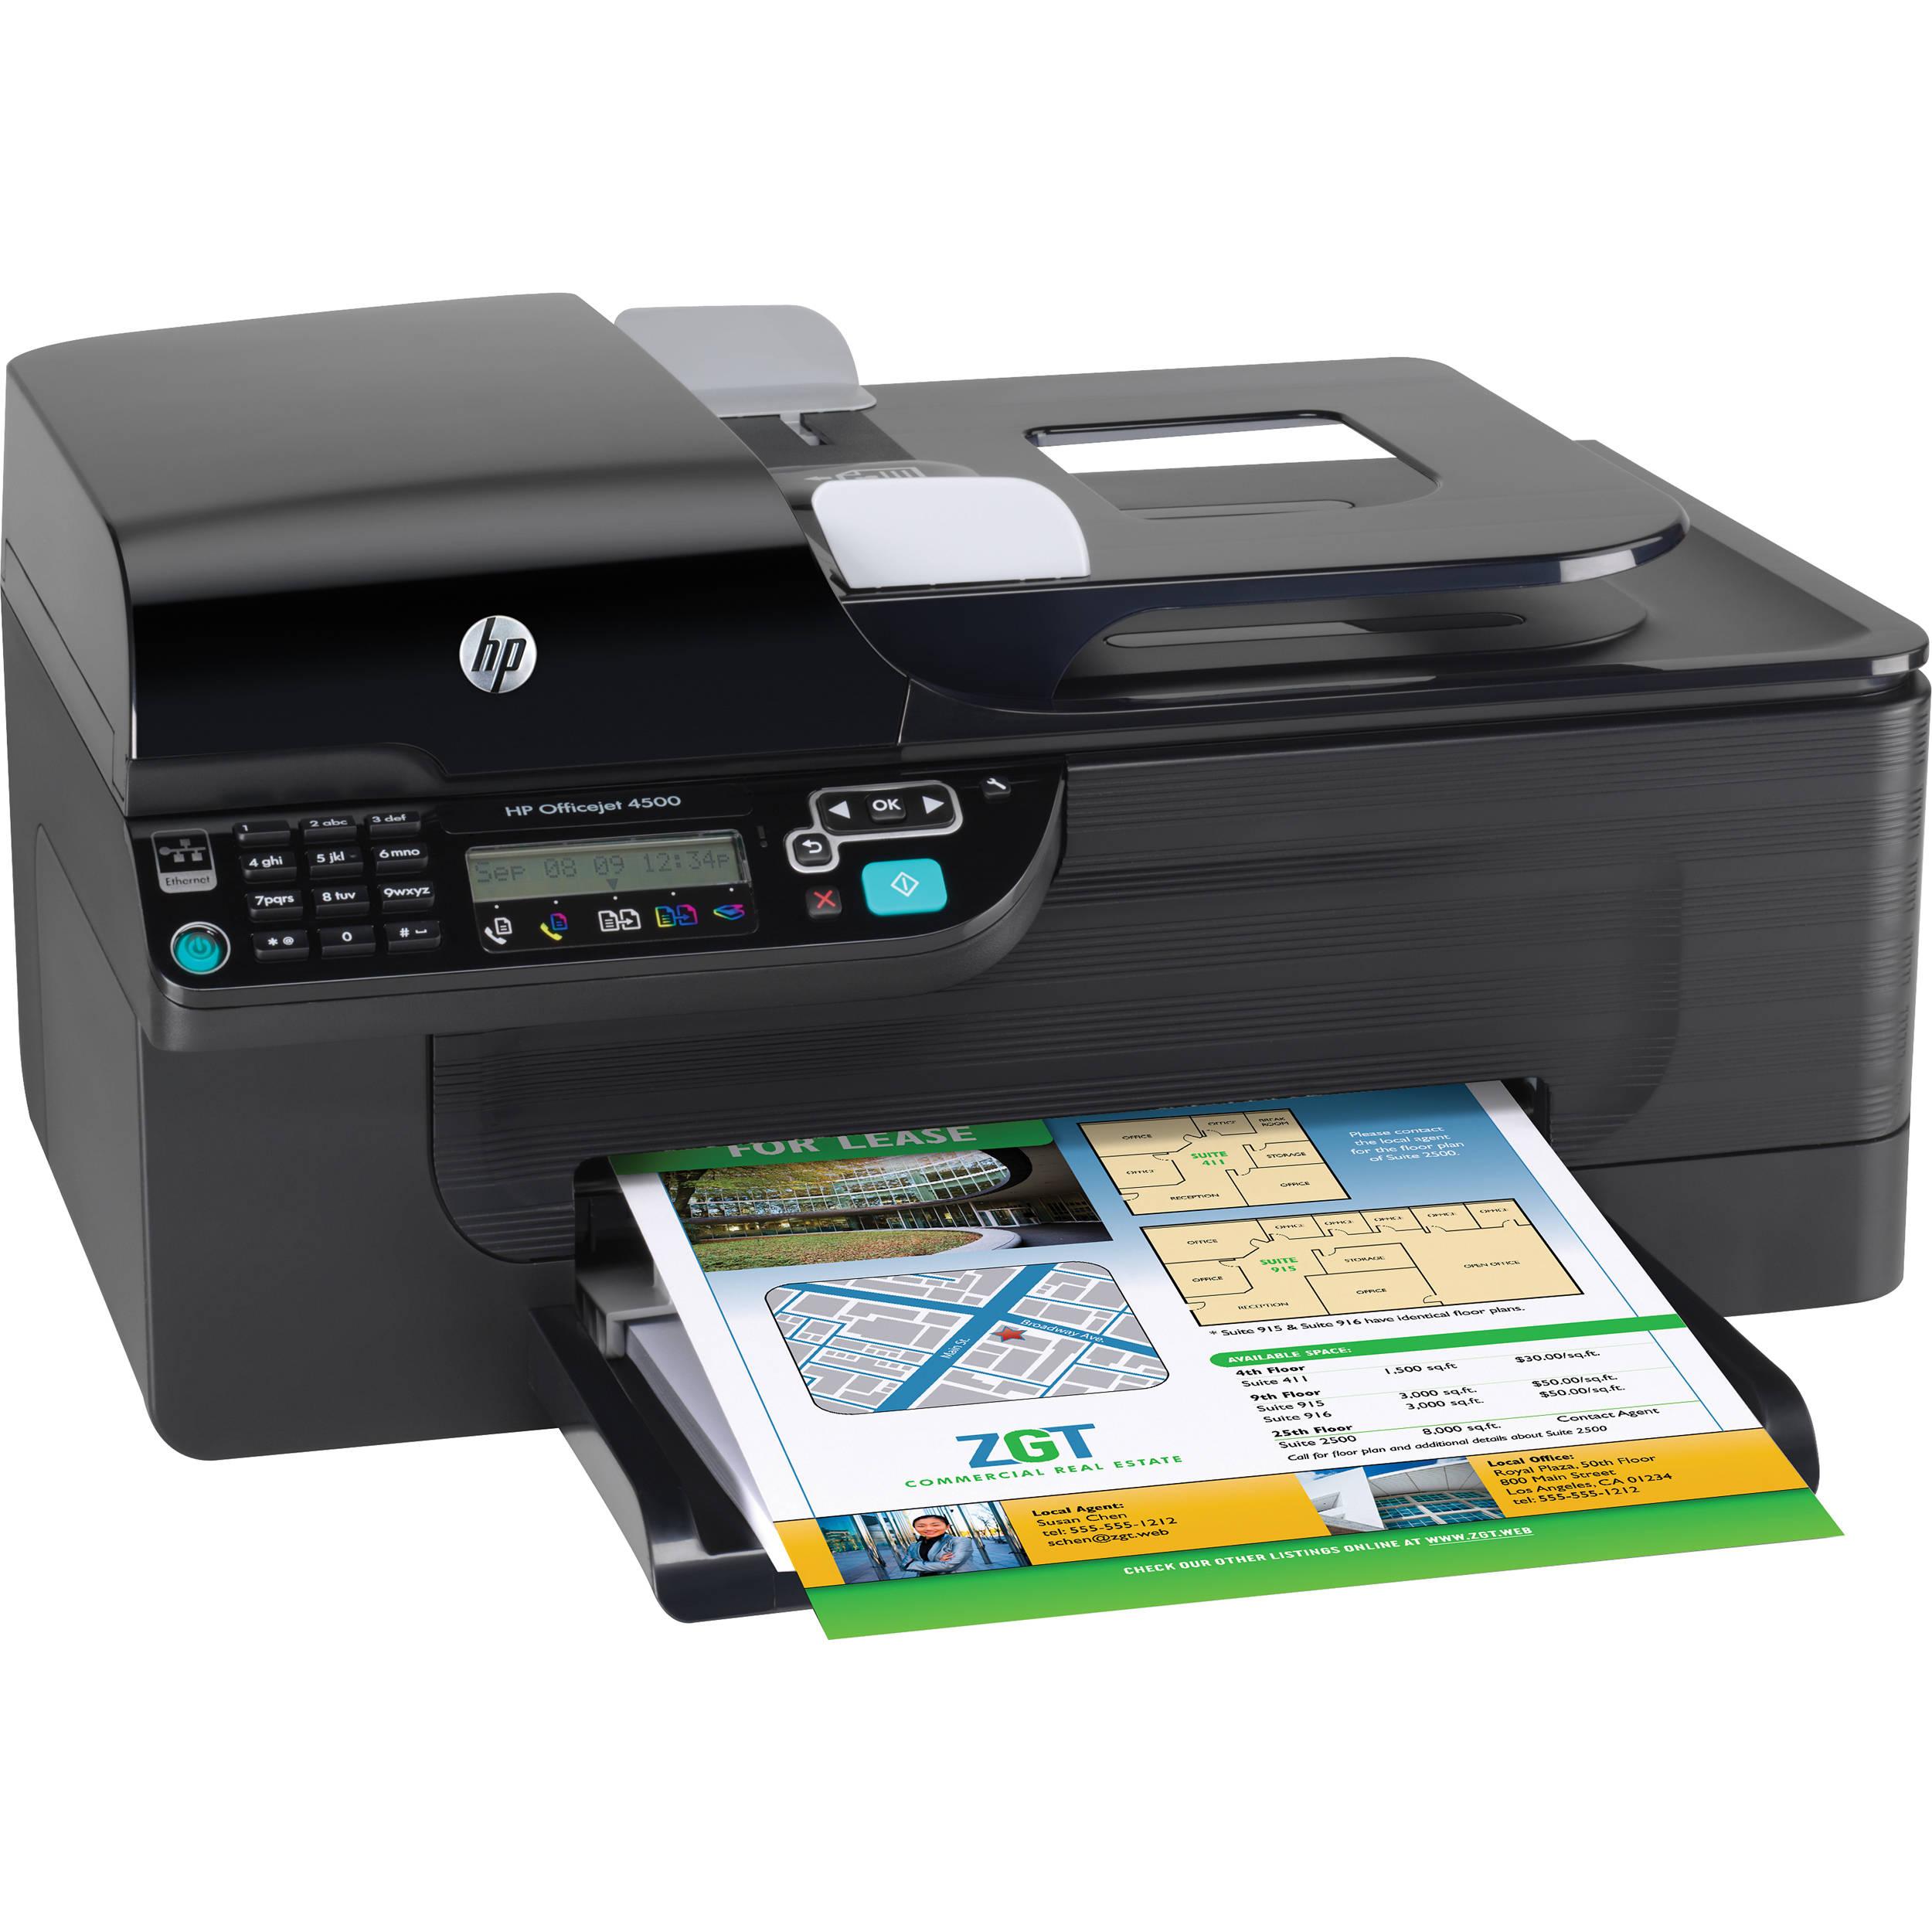 hp cb867a officejet 4500 all in one printer cb867a b1h b h photo rh bhphotovideo com owner's manual hp officejet 4500 owners manual hp officejet 4500 desktop